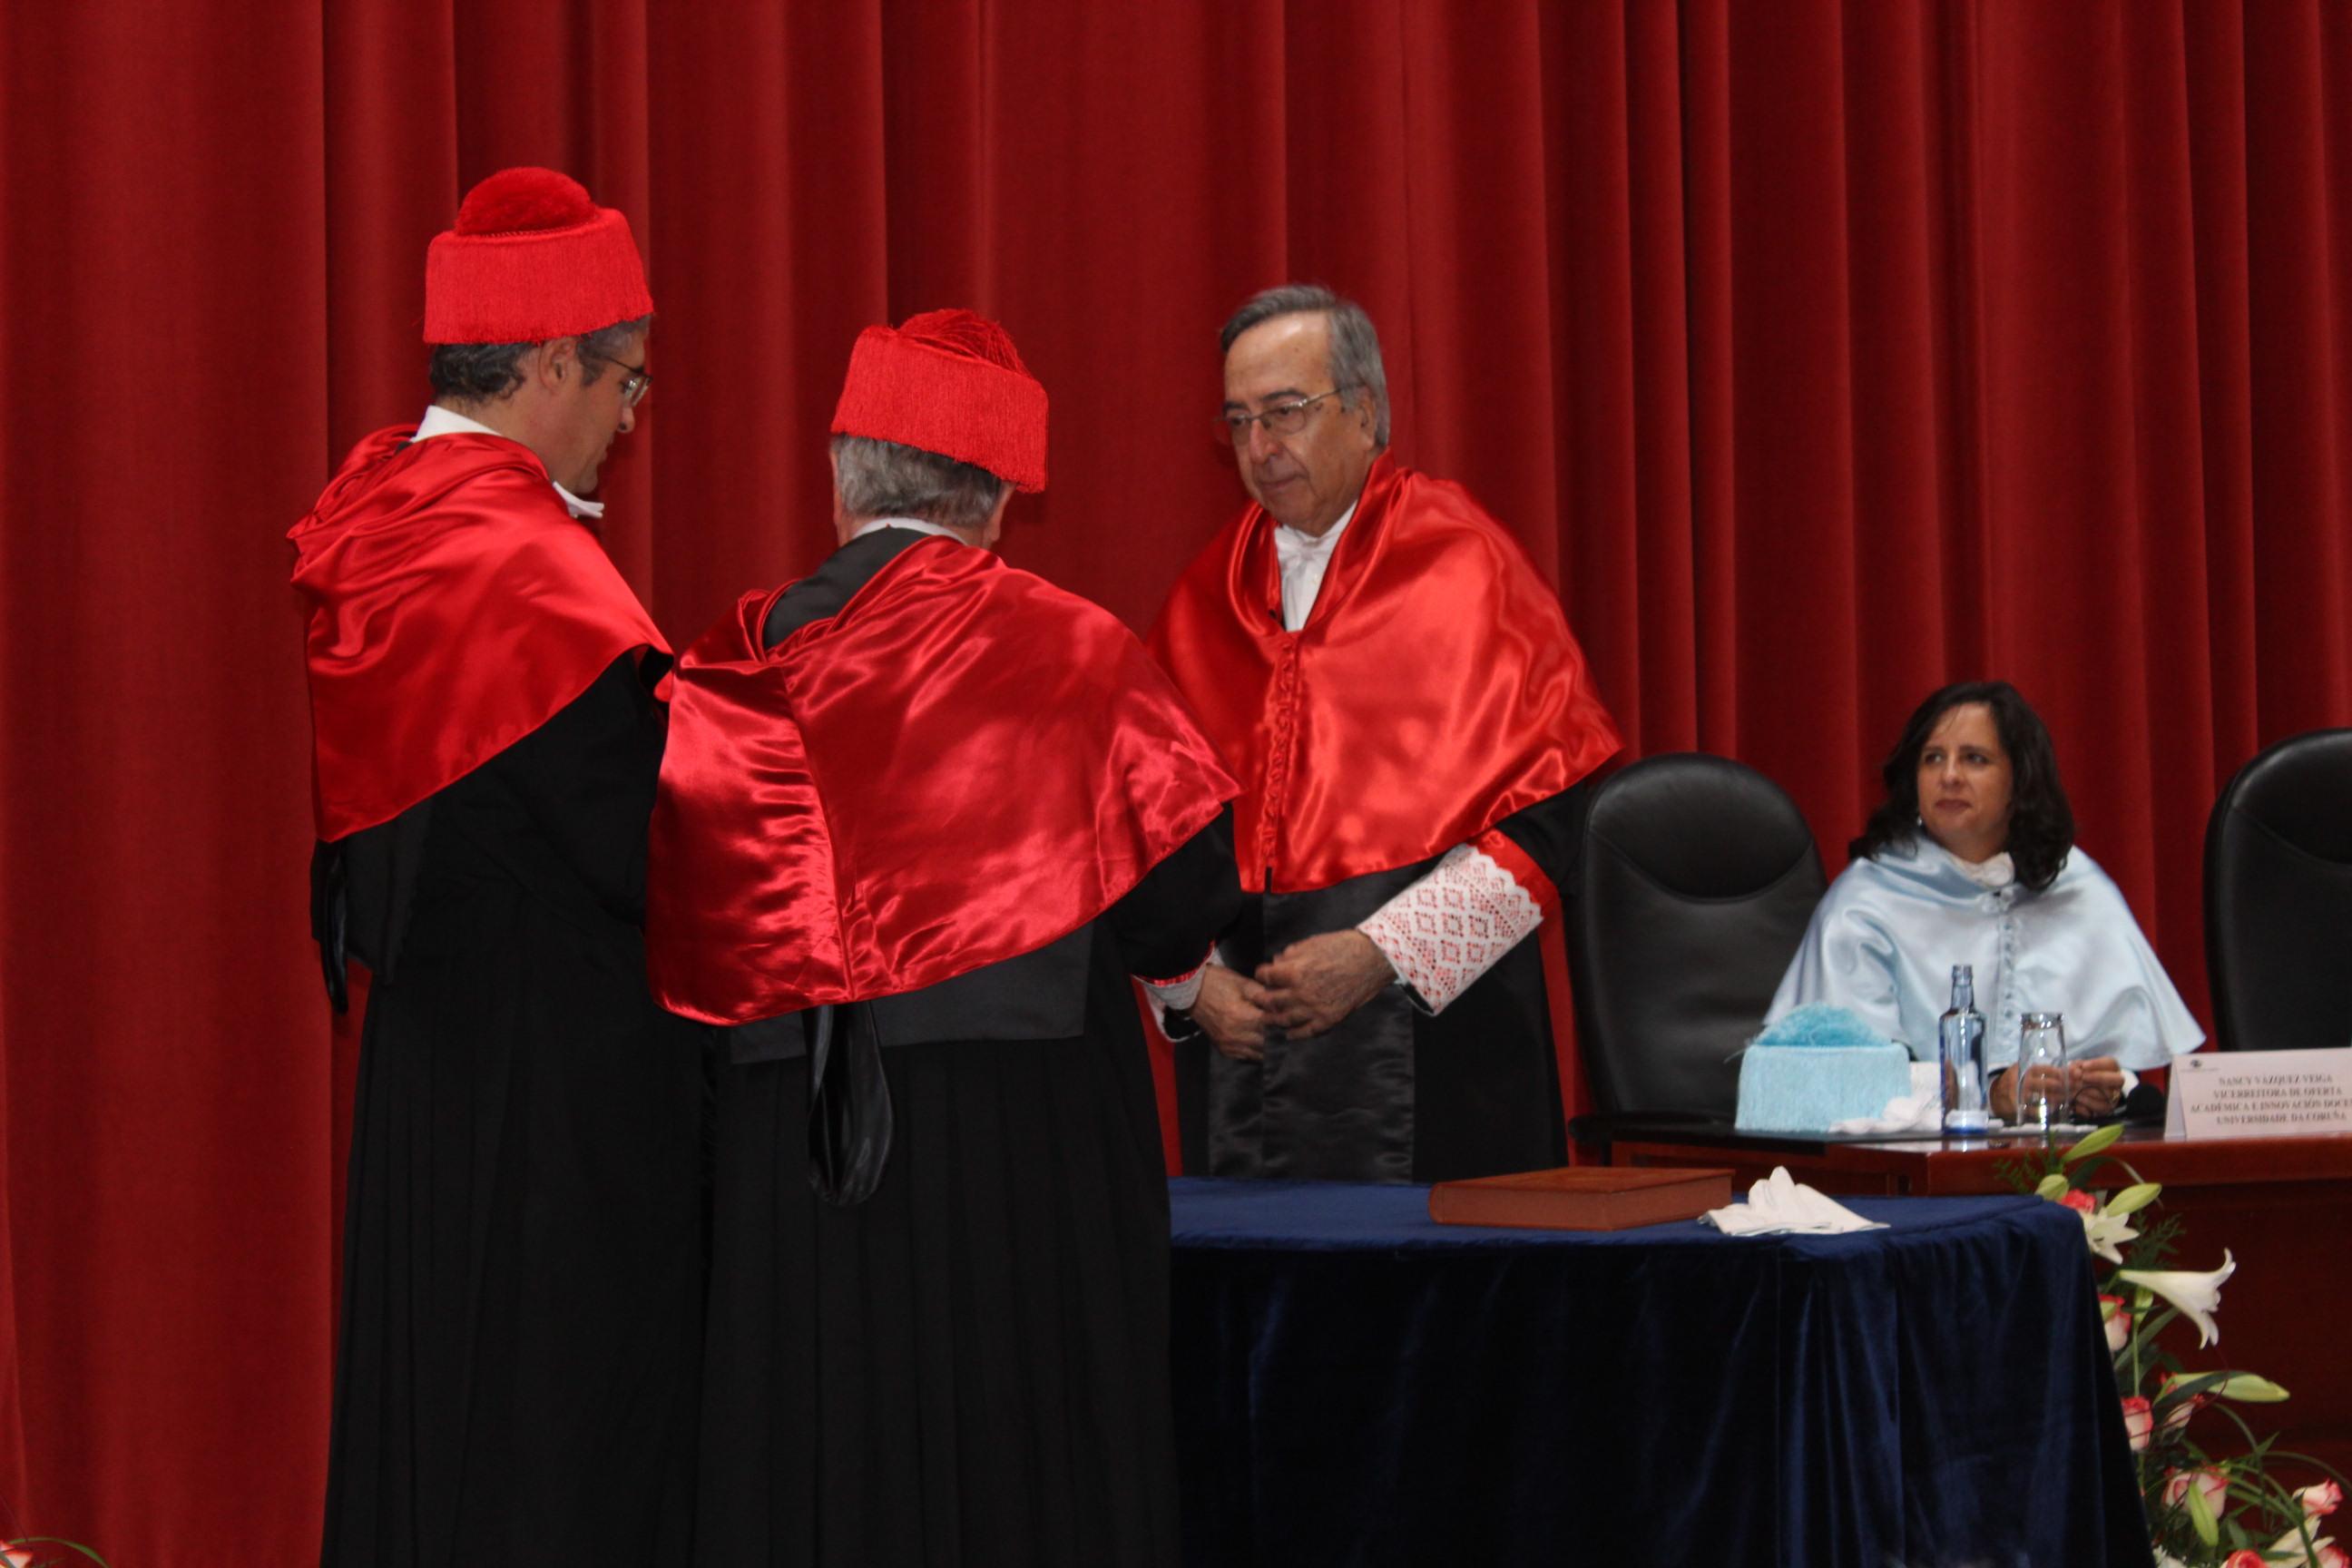 De izqda. a dcha.: Carlos Aymerich, Carlos Martínez-Buján, Enrique Orts, Nancy Vázquez Veiga